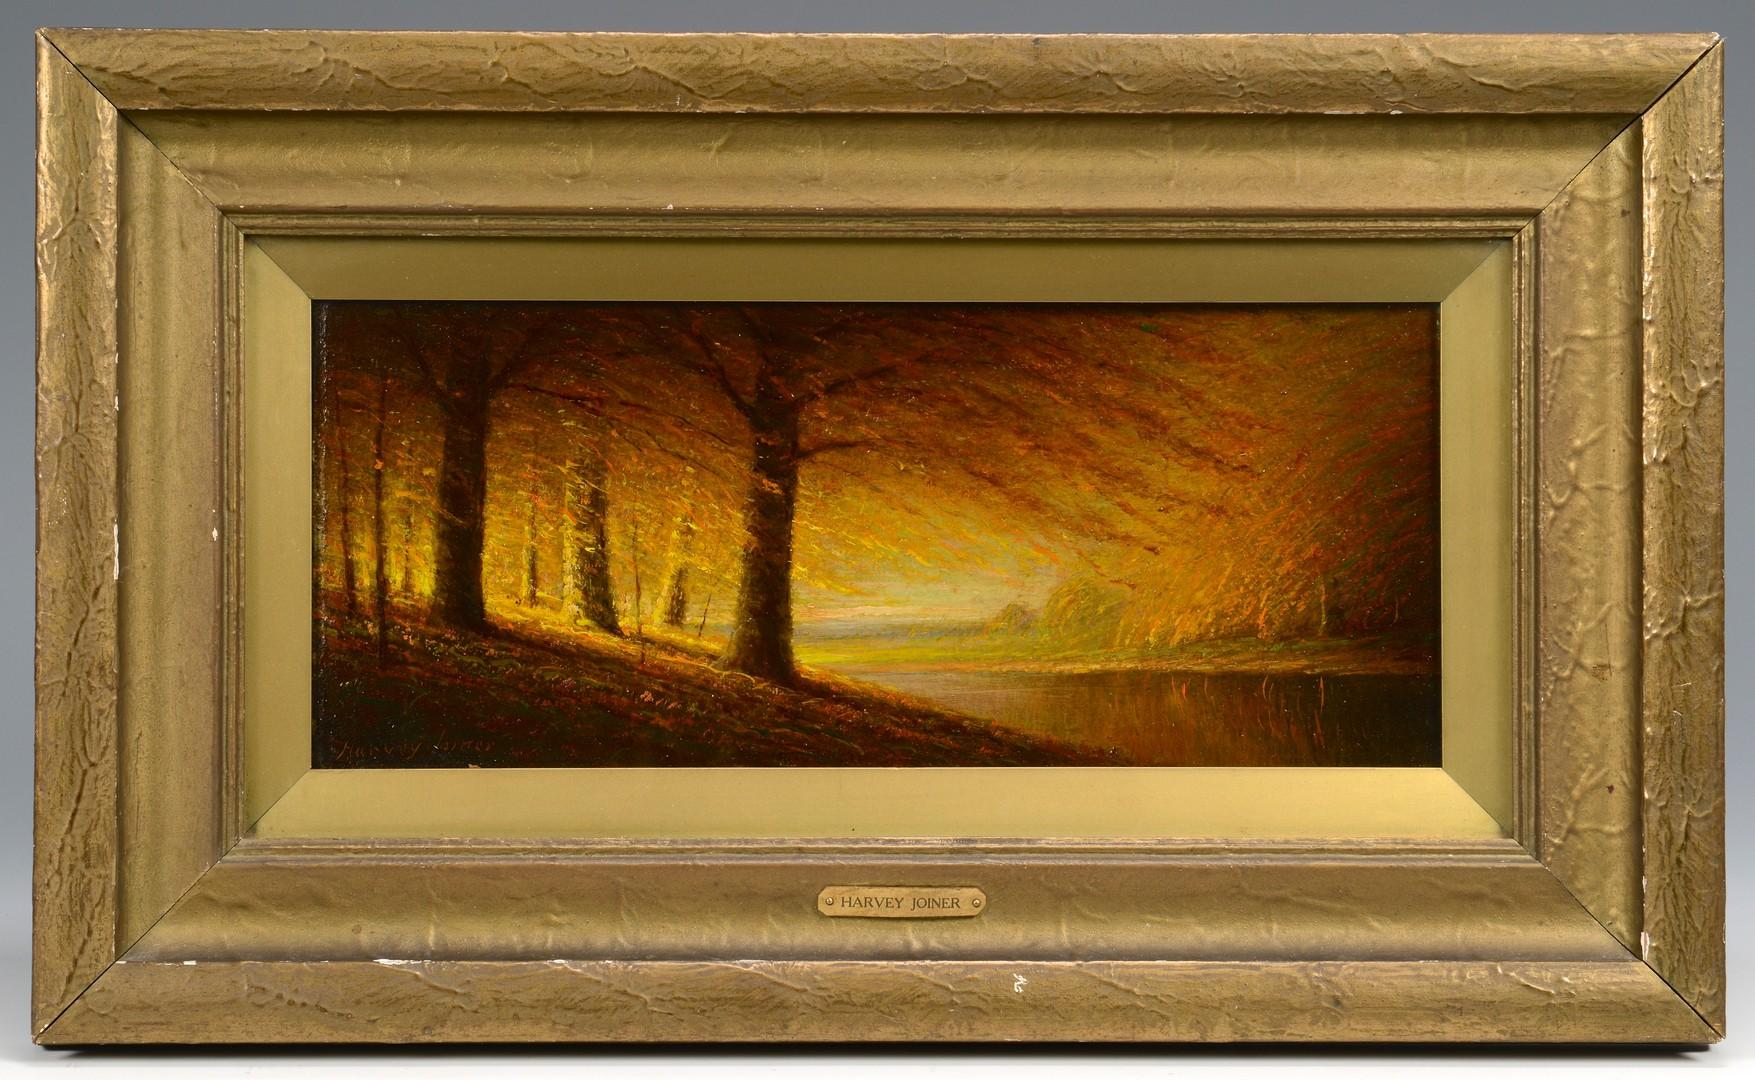 Lot 127: Harvey Joiner O/B, Autumn Landscape